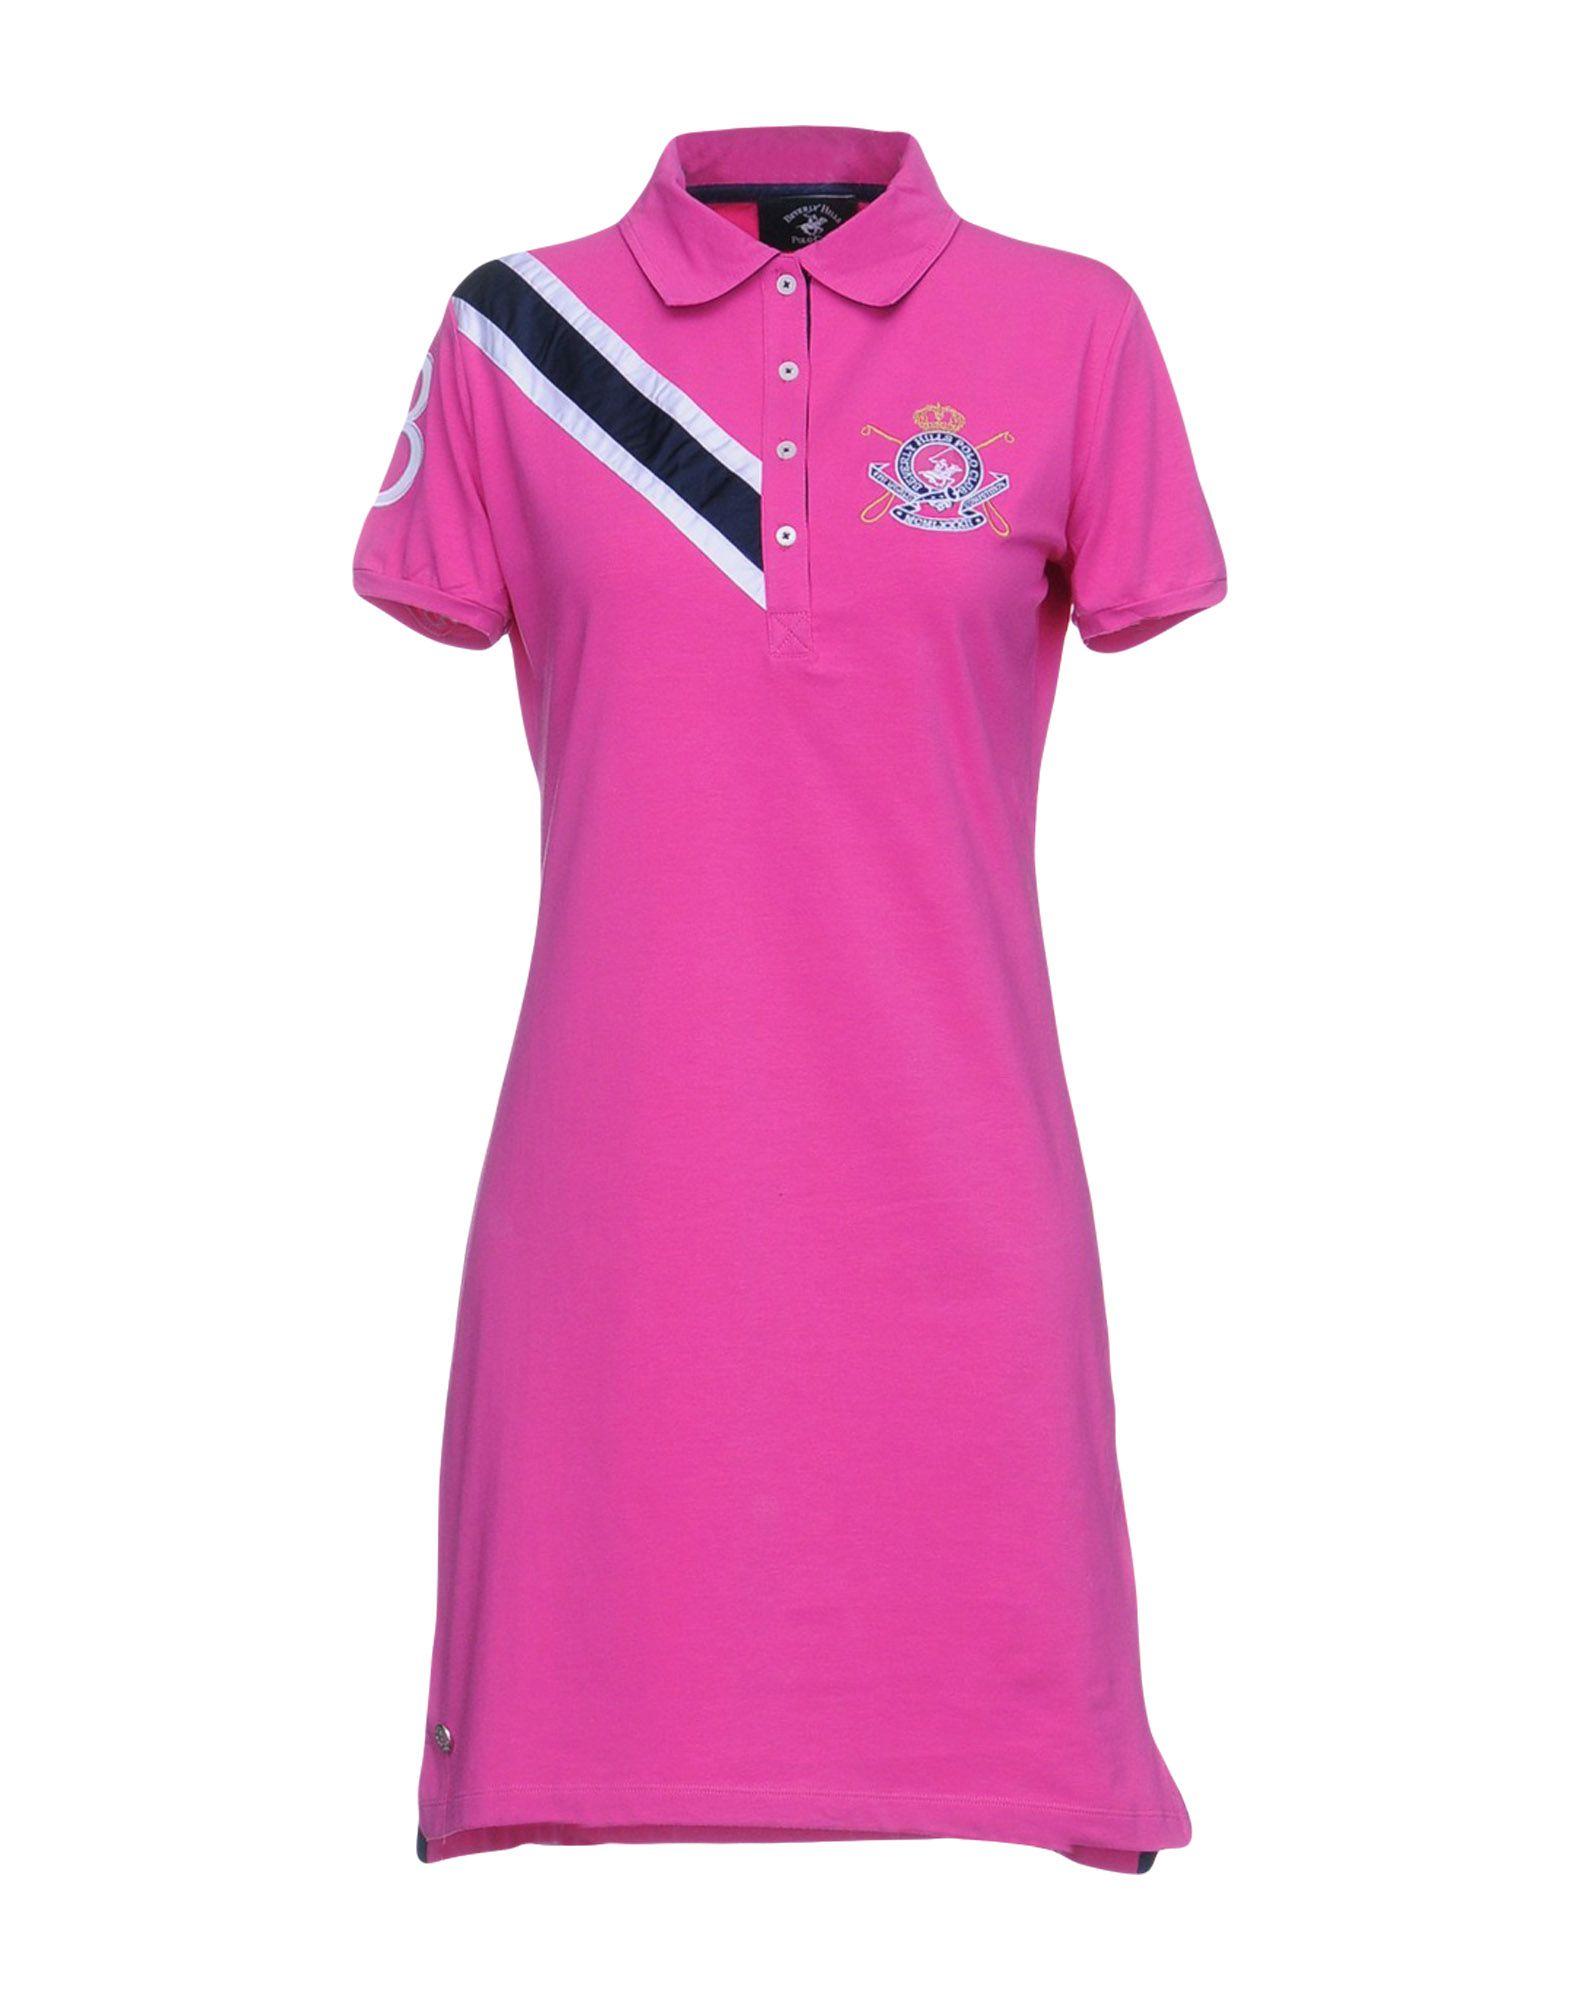 BEVERLY HILLS POLO CLUB Damen Kurzes Kleid Farbe Fuchsia Größe 4